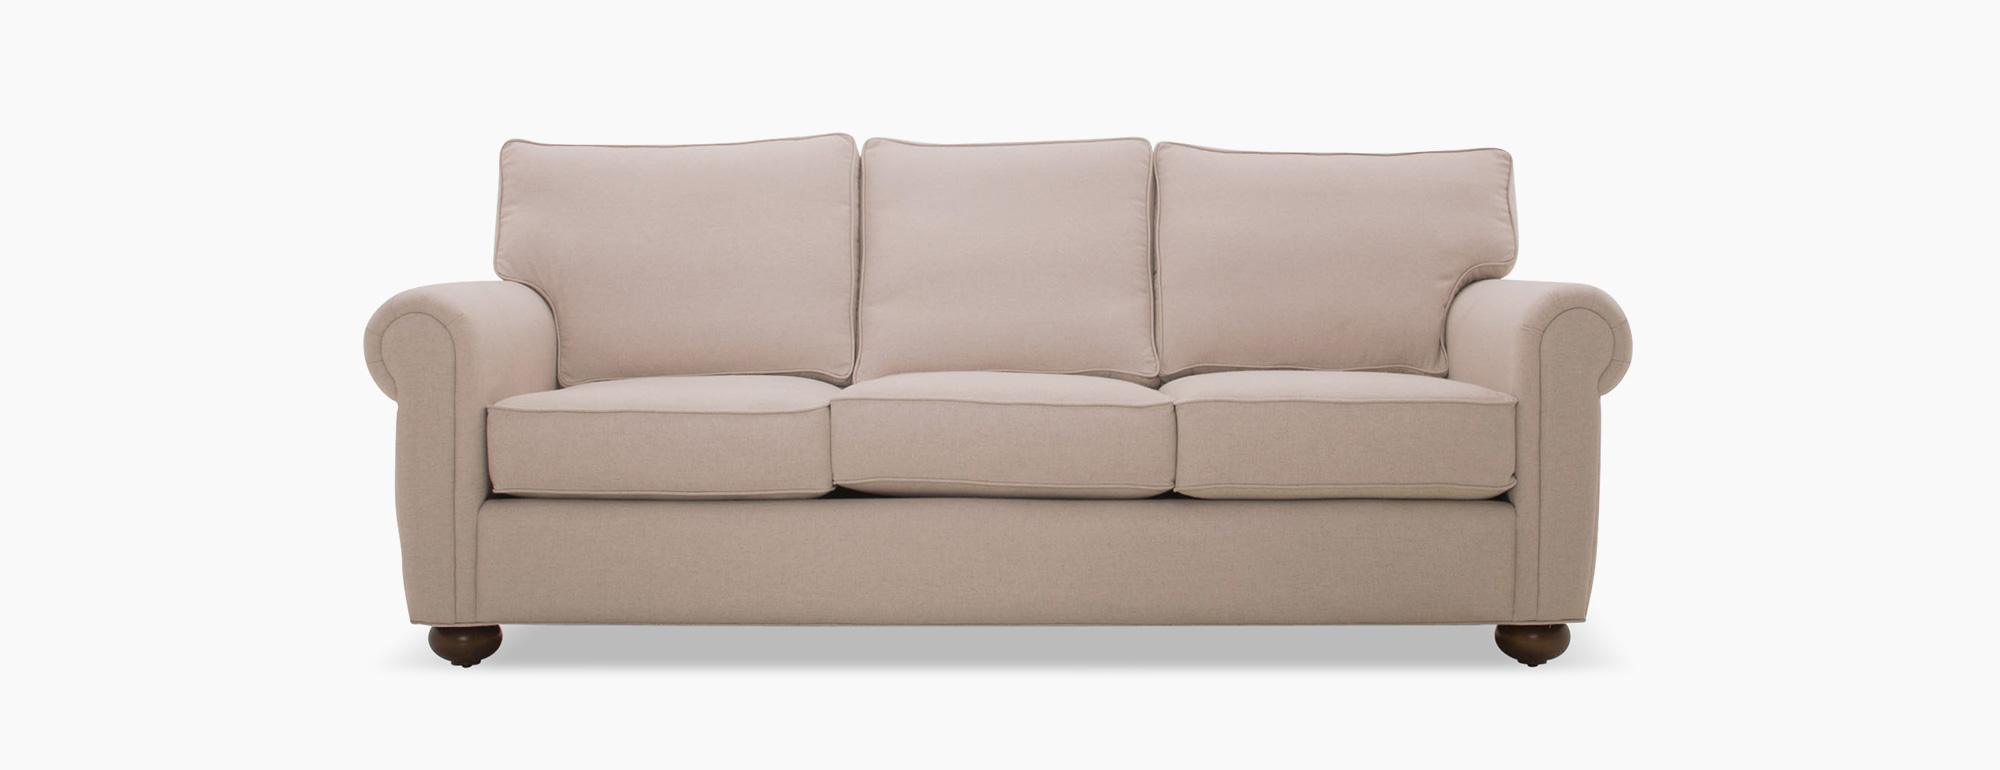 hero-oliver-sofa-1